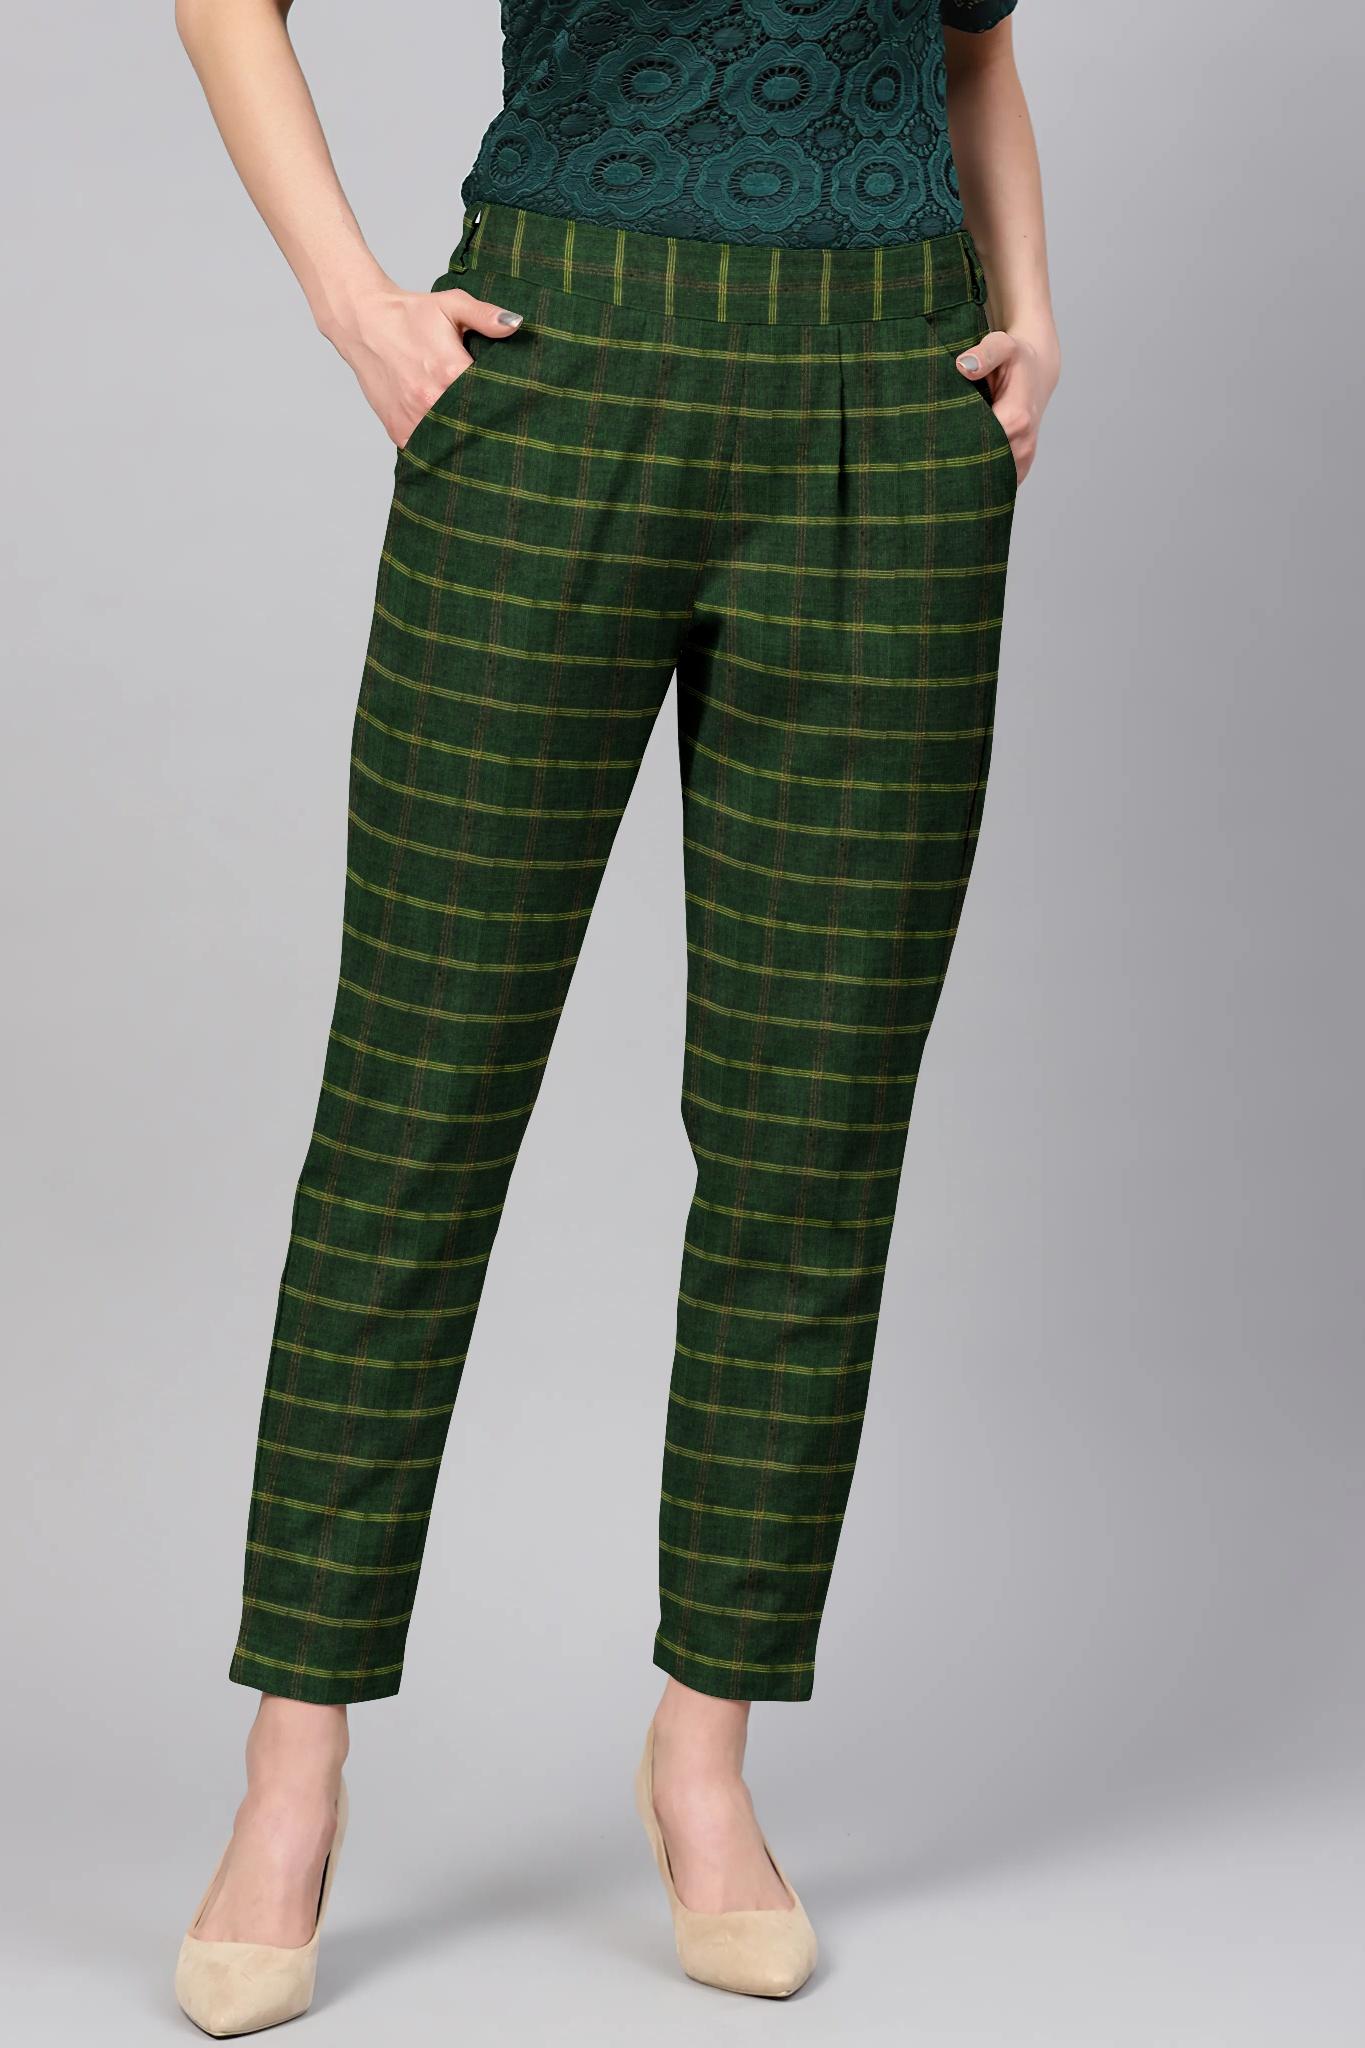 /home/customer/www/fabartcraft.com/public_html/uploadshttps://www.shopolics.com/uploads/images/medium/Green-Yellow-Cotton-Stripe-Regular-Fit-Solid-Trouser-36069.jpg